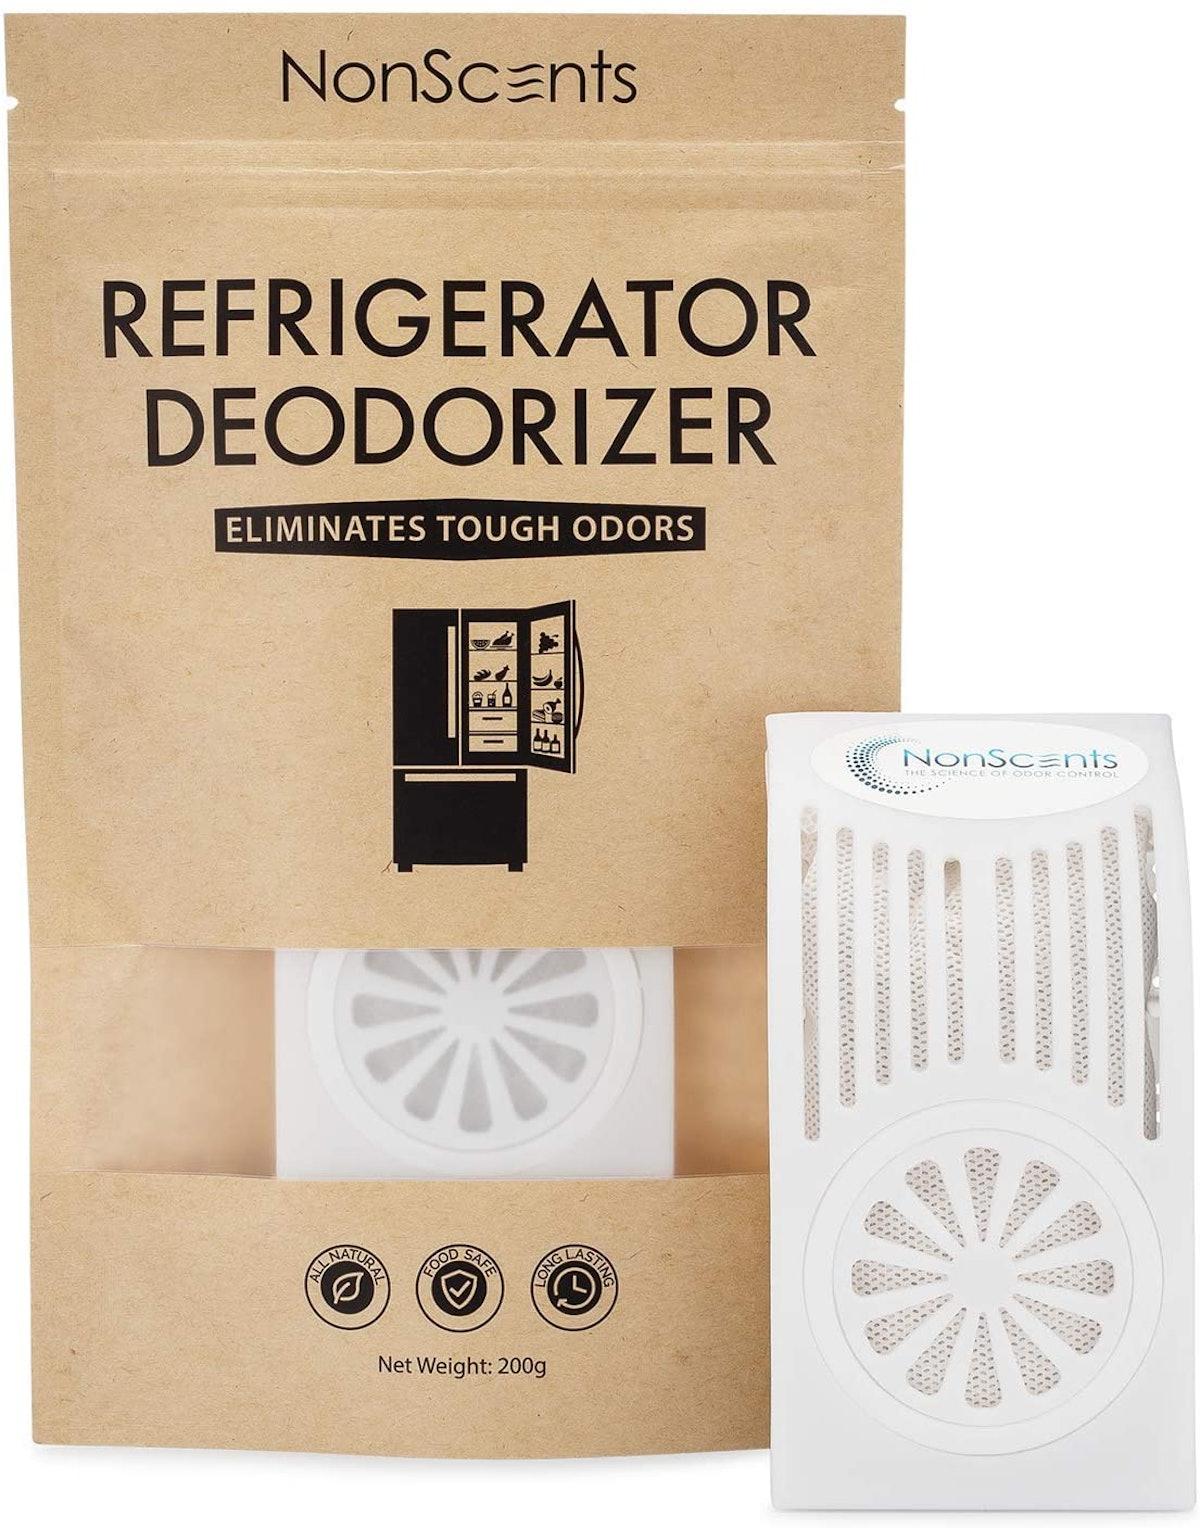 NonScents Refrigerator Deodorizer - Fridge and Freezer Odor Eliminator